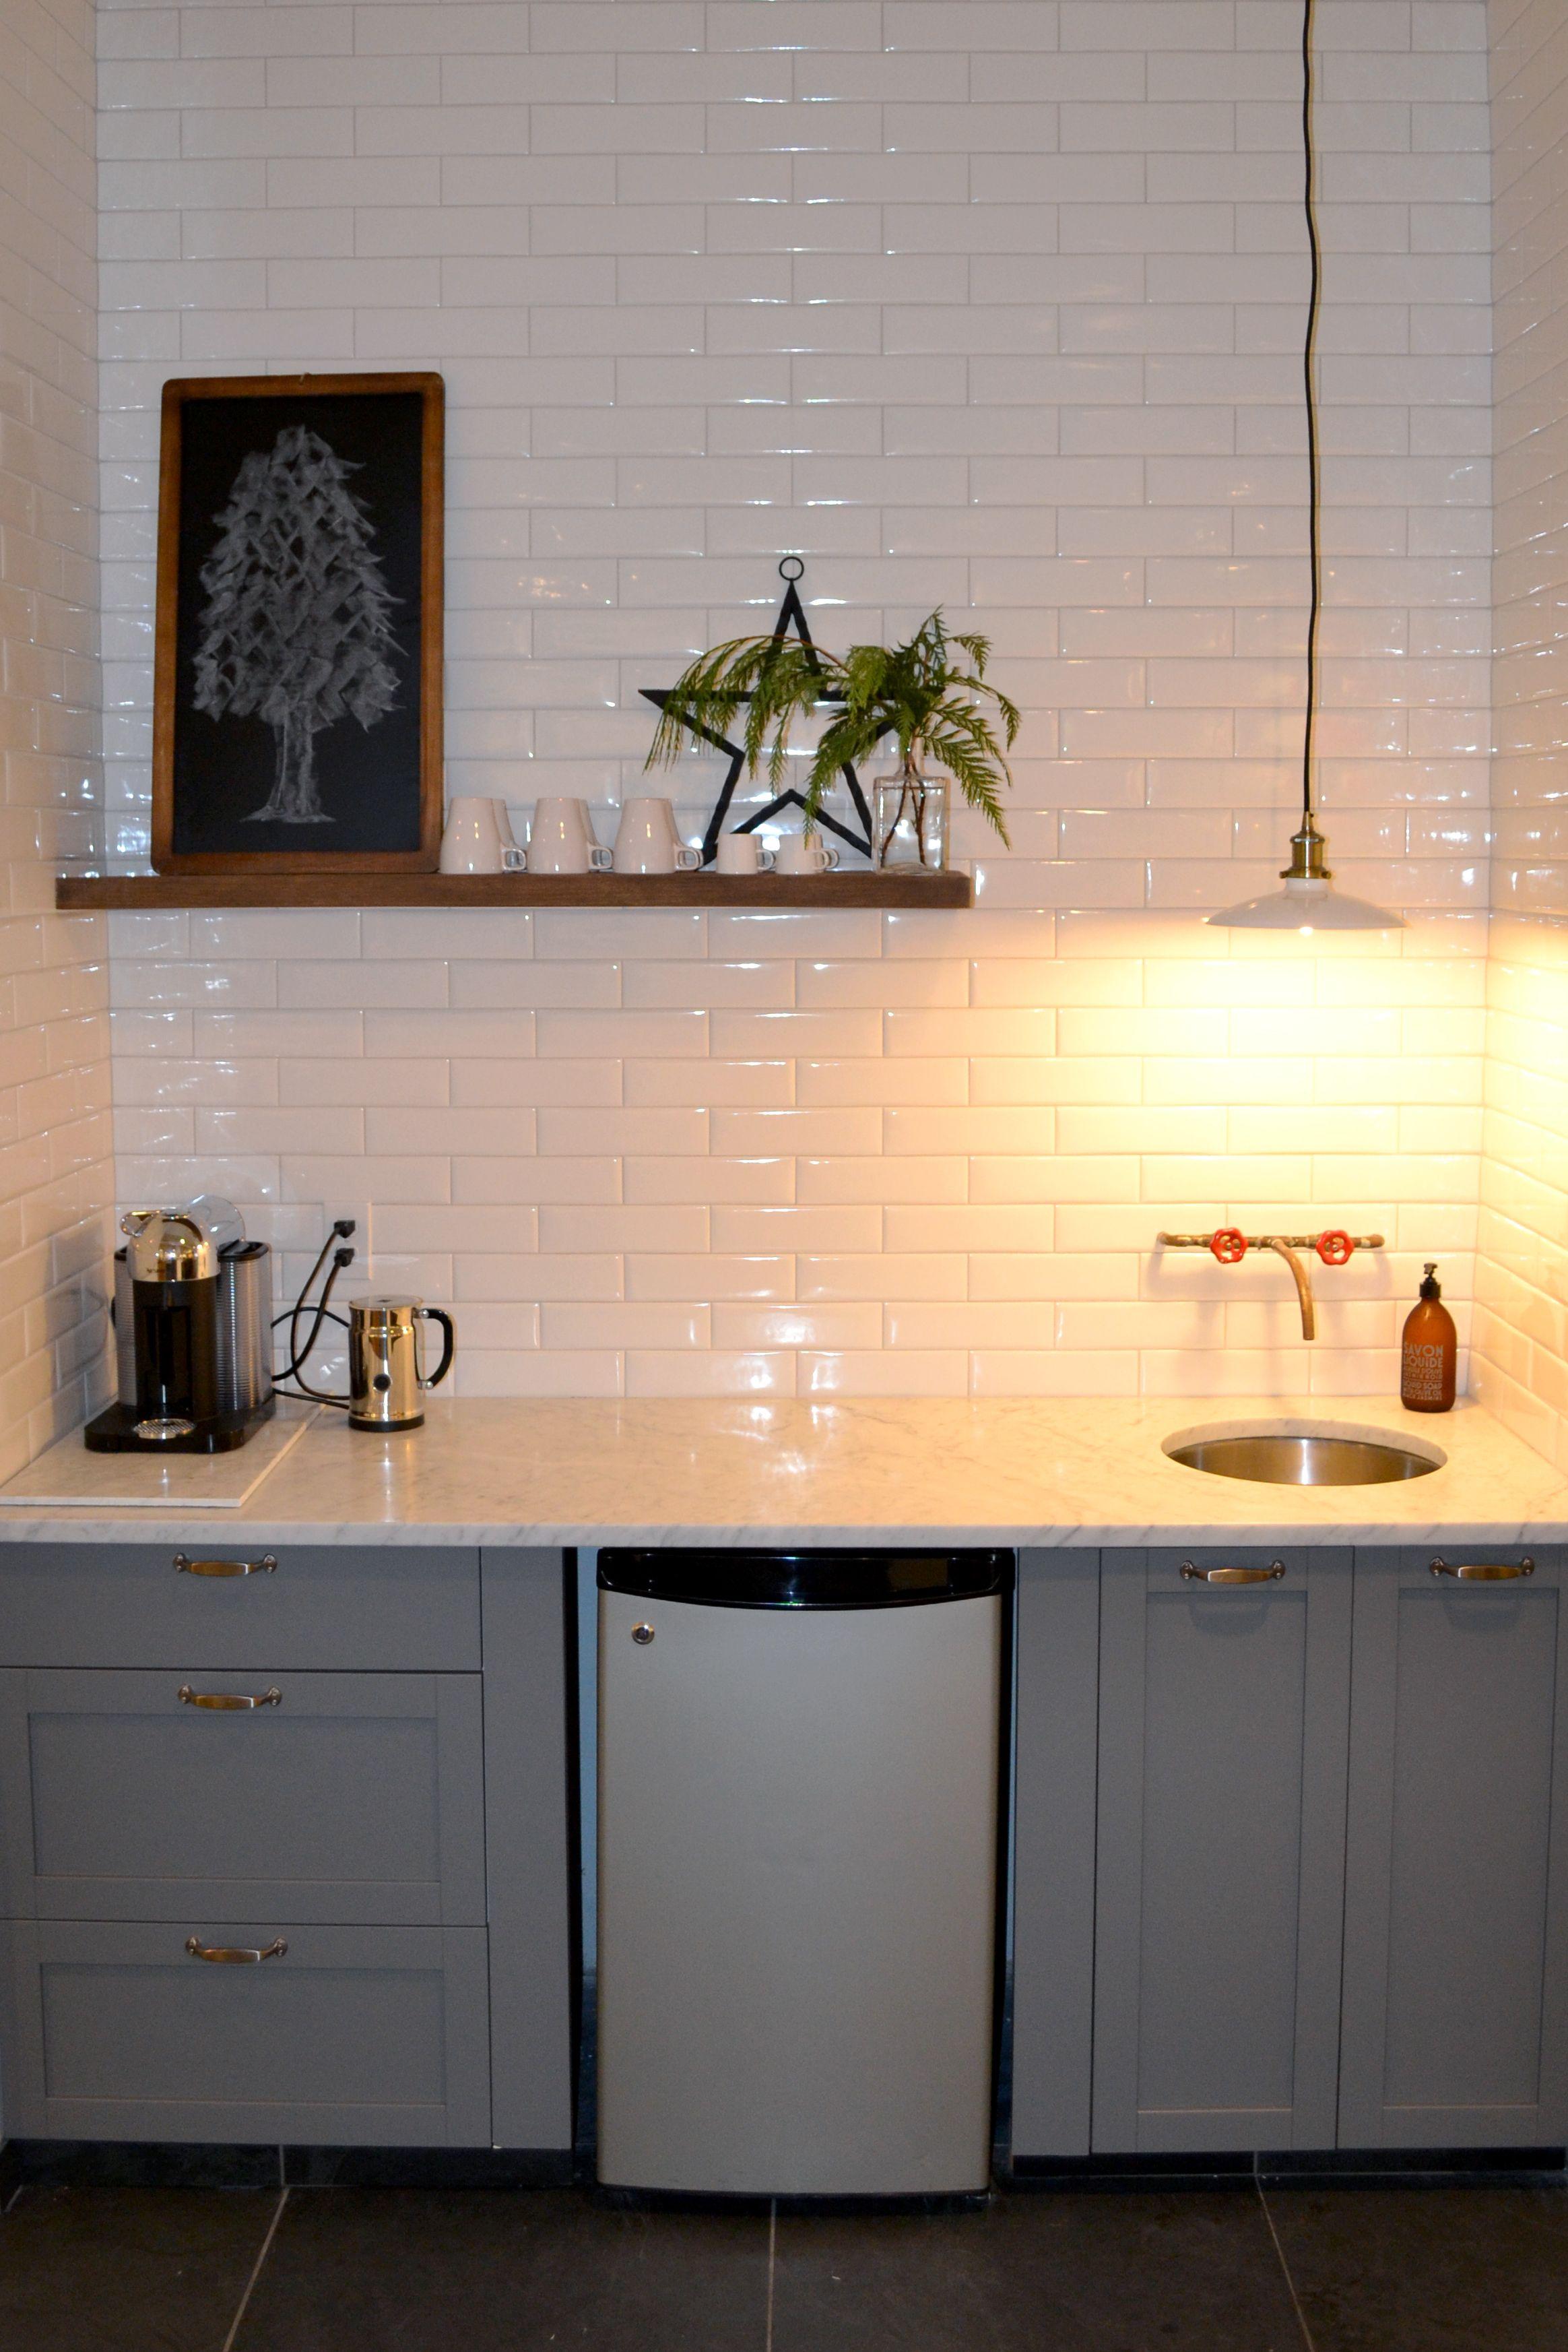 LIVERPOOL by Ceragres #tiles #ceramics #white #kitchen | Backsplash ...